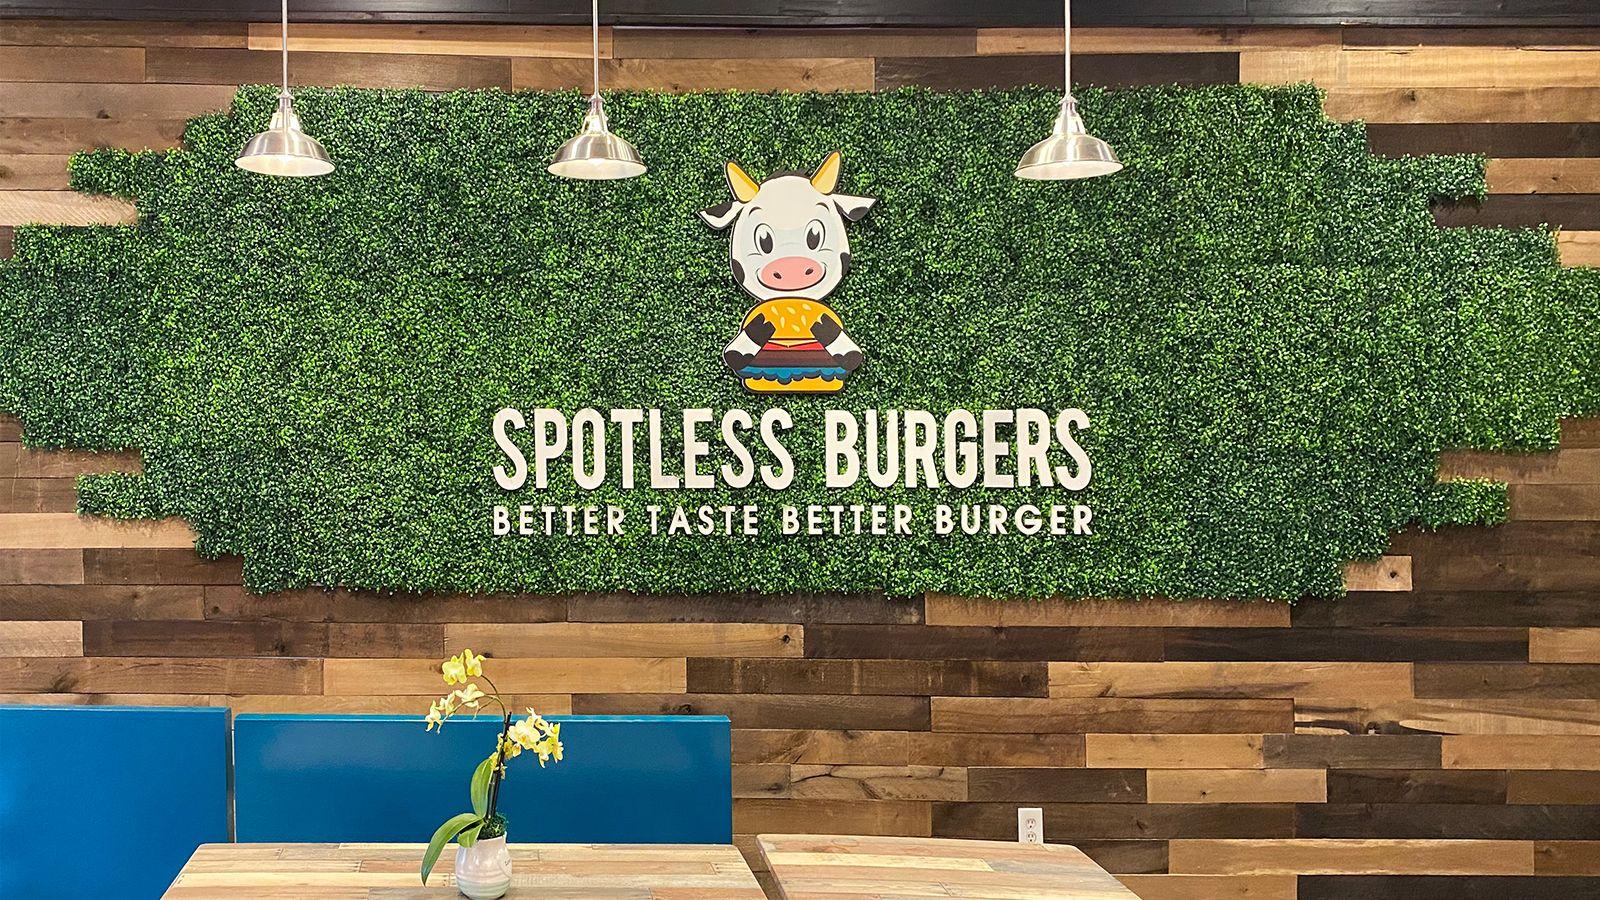 Spotless Burger 3D letters